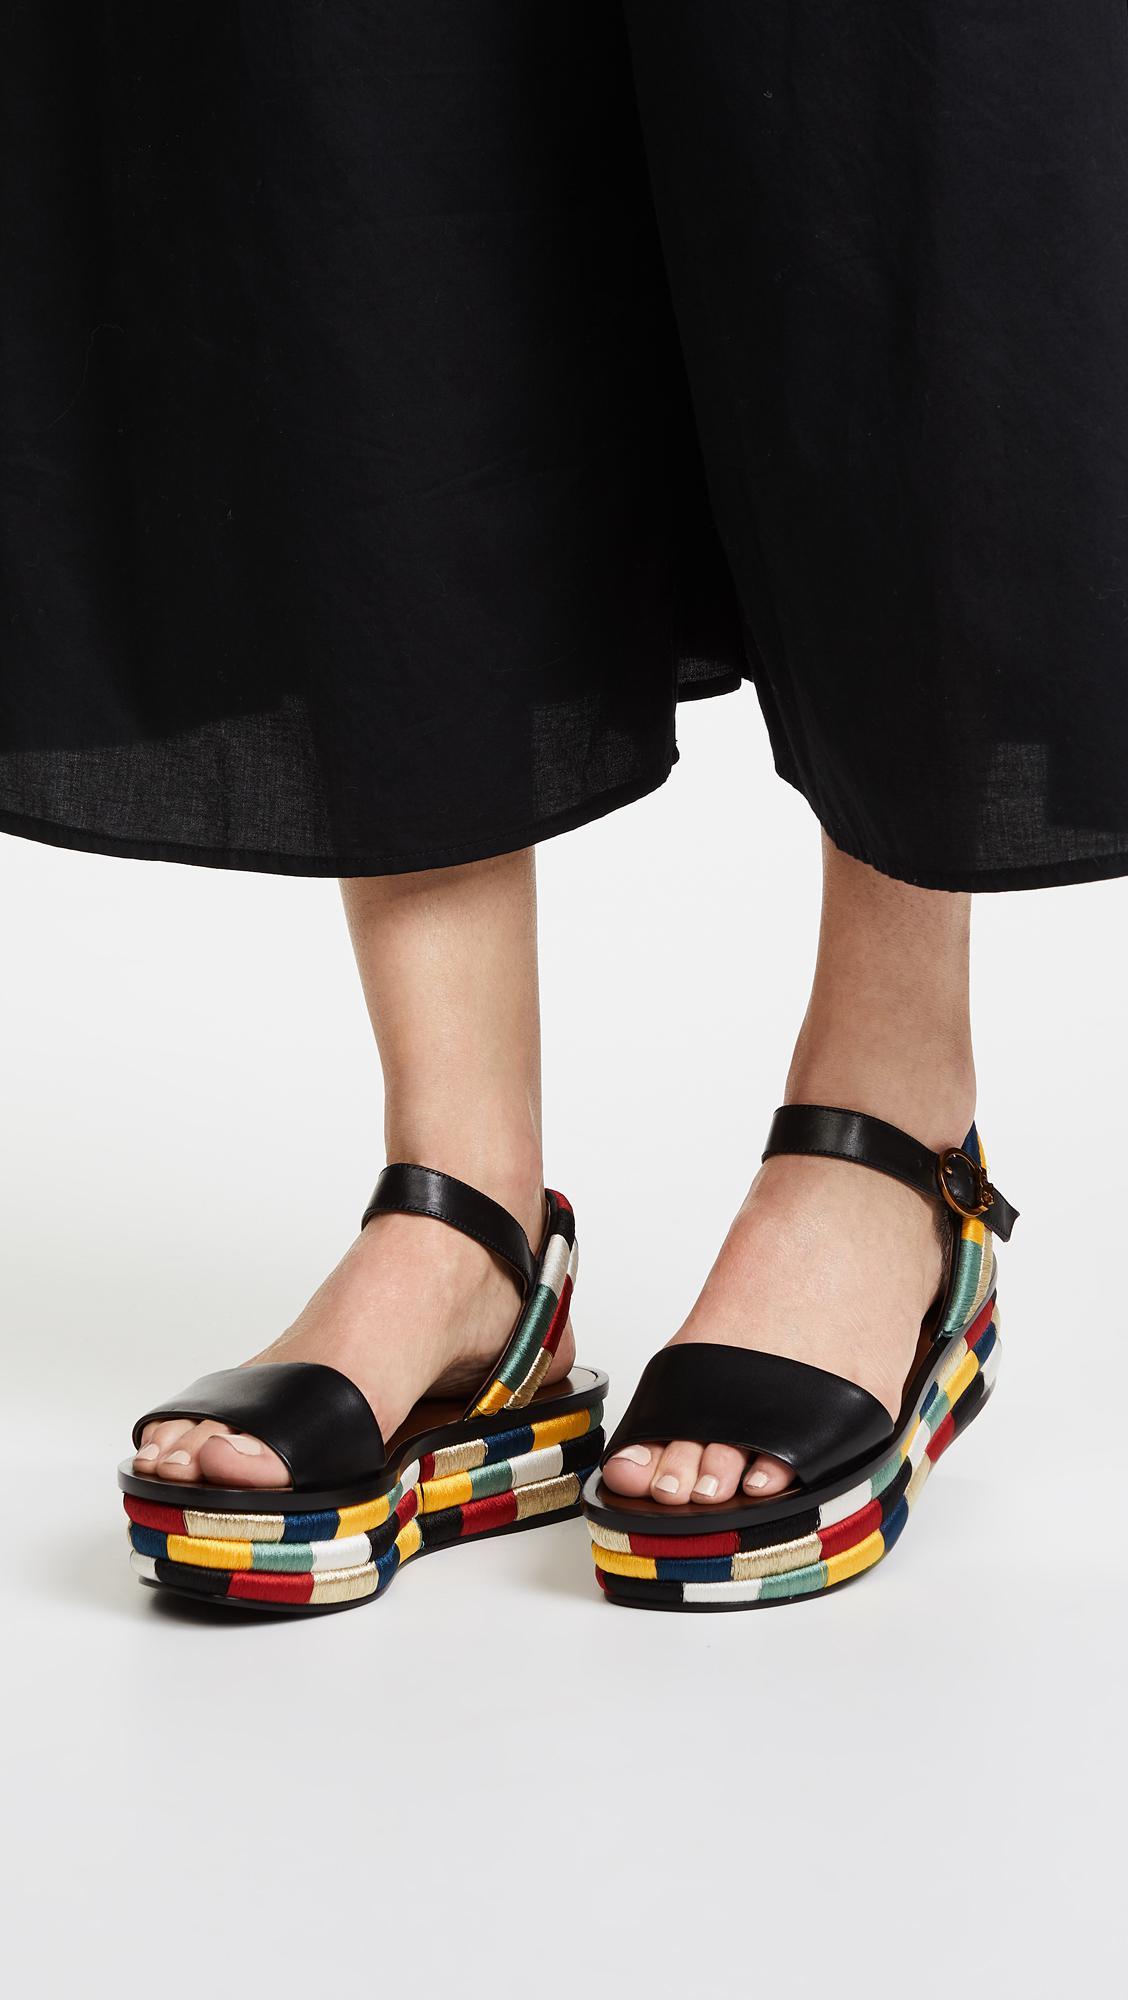 dd1987f31f9e Lyst - Tory Burch Camilla 40mm Platform Sandals in Black